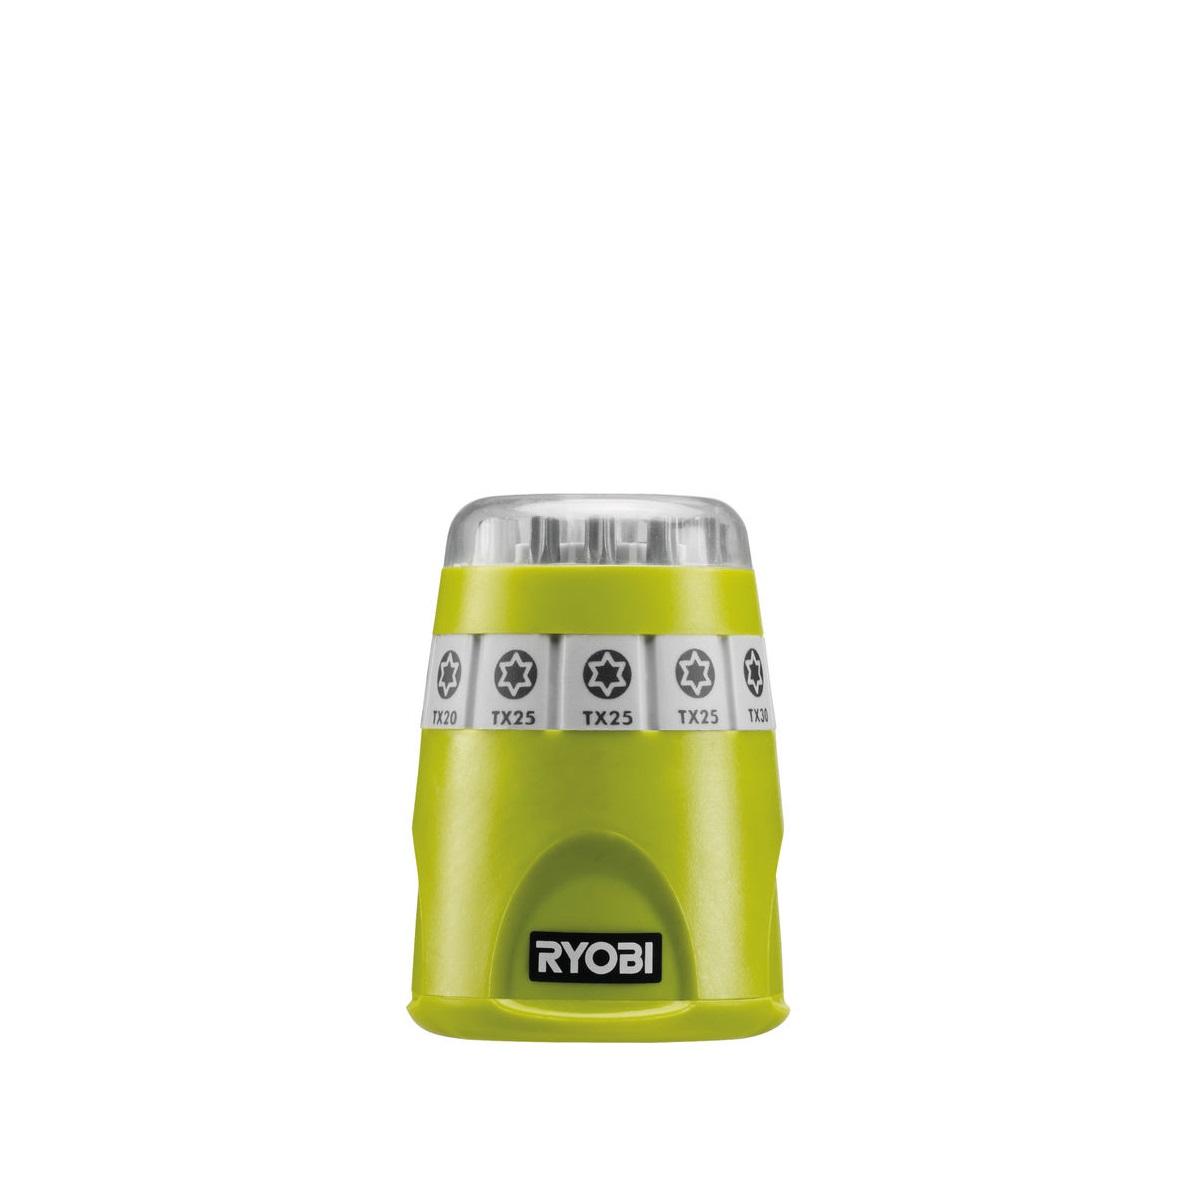 Ryobi RAK10TSD